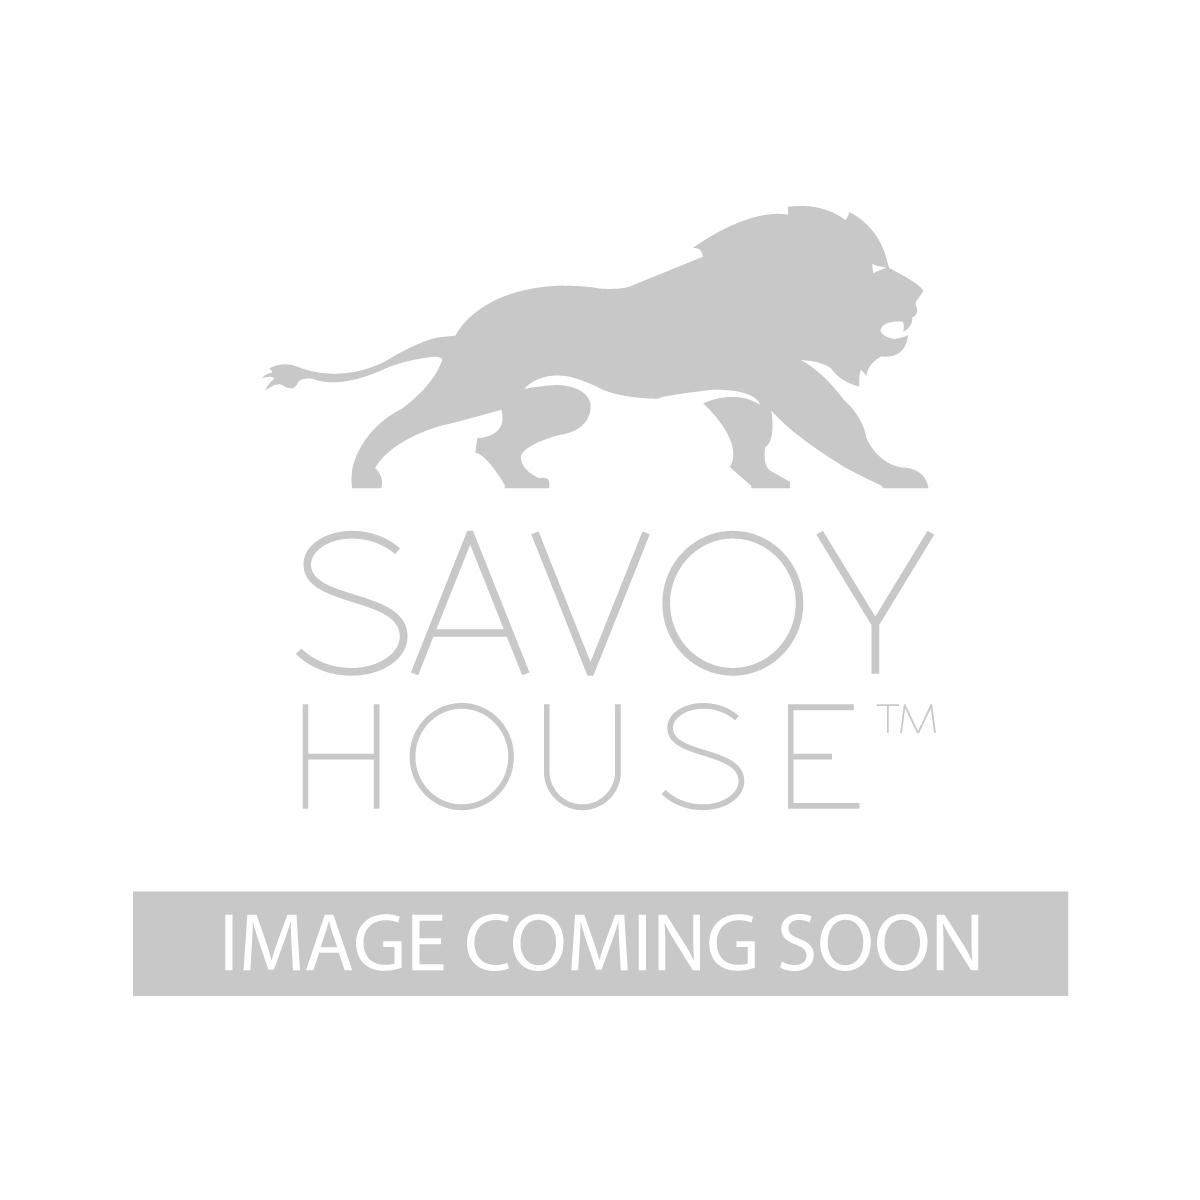 Hartford 1 Light Sconce  sc 1 st  Savoy House & 9-100-1-44 Hartford 1 Light Sconce by Savoy House azcodes.com